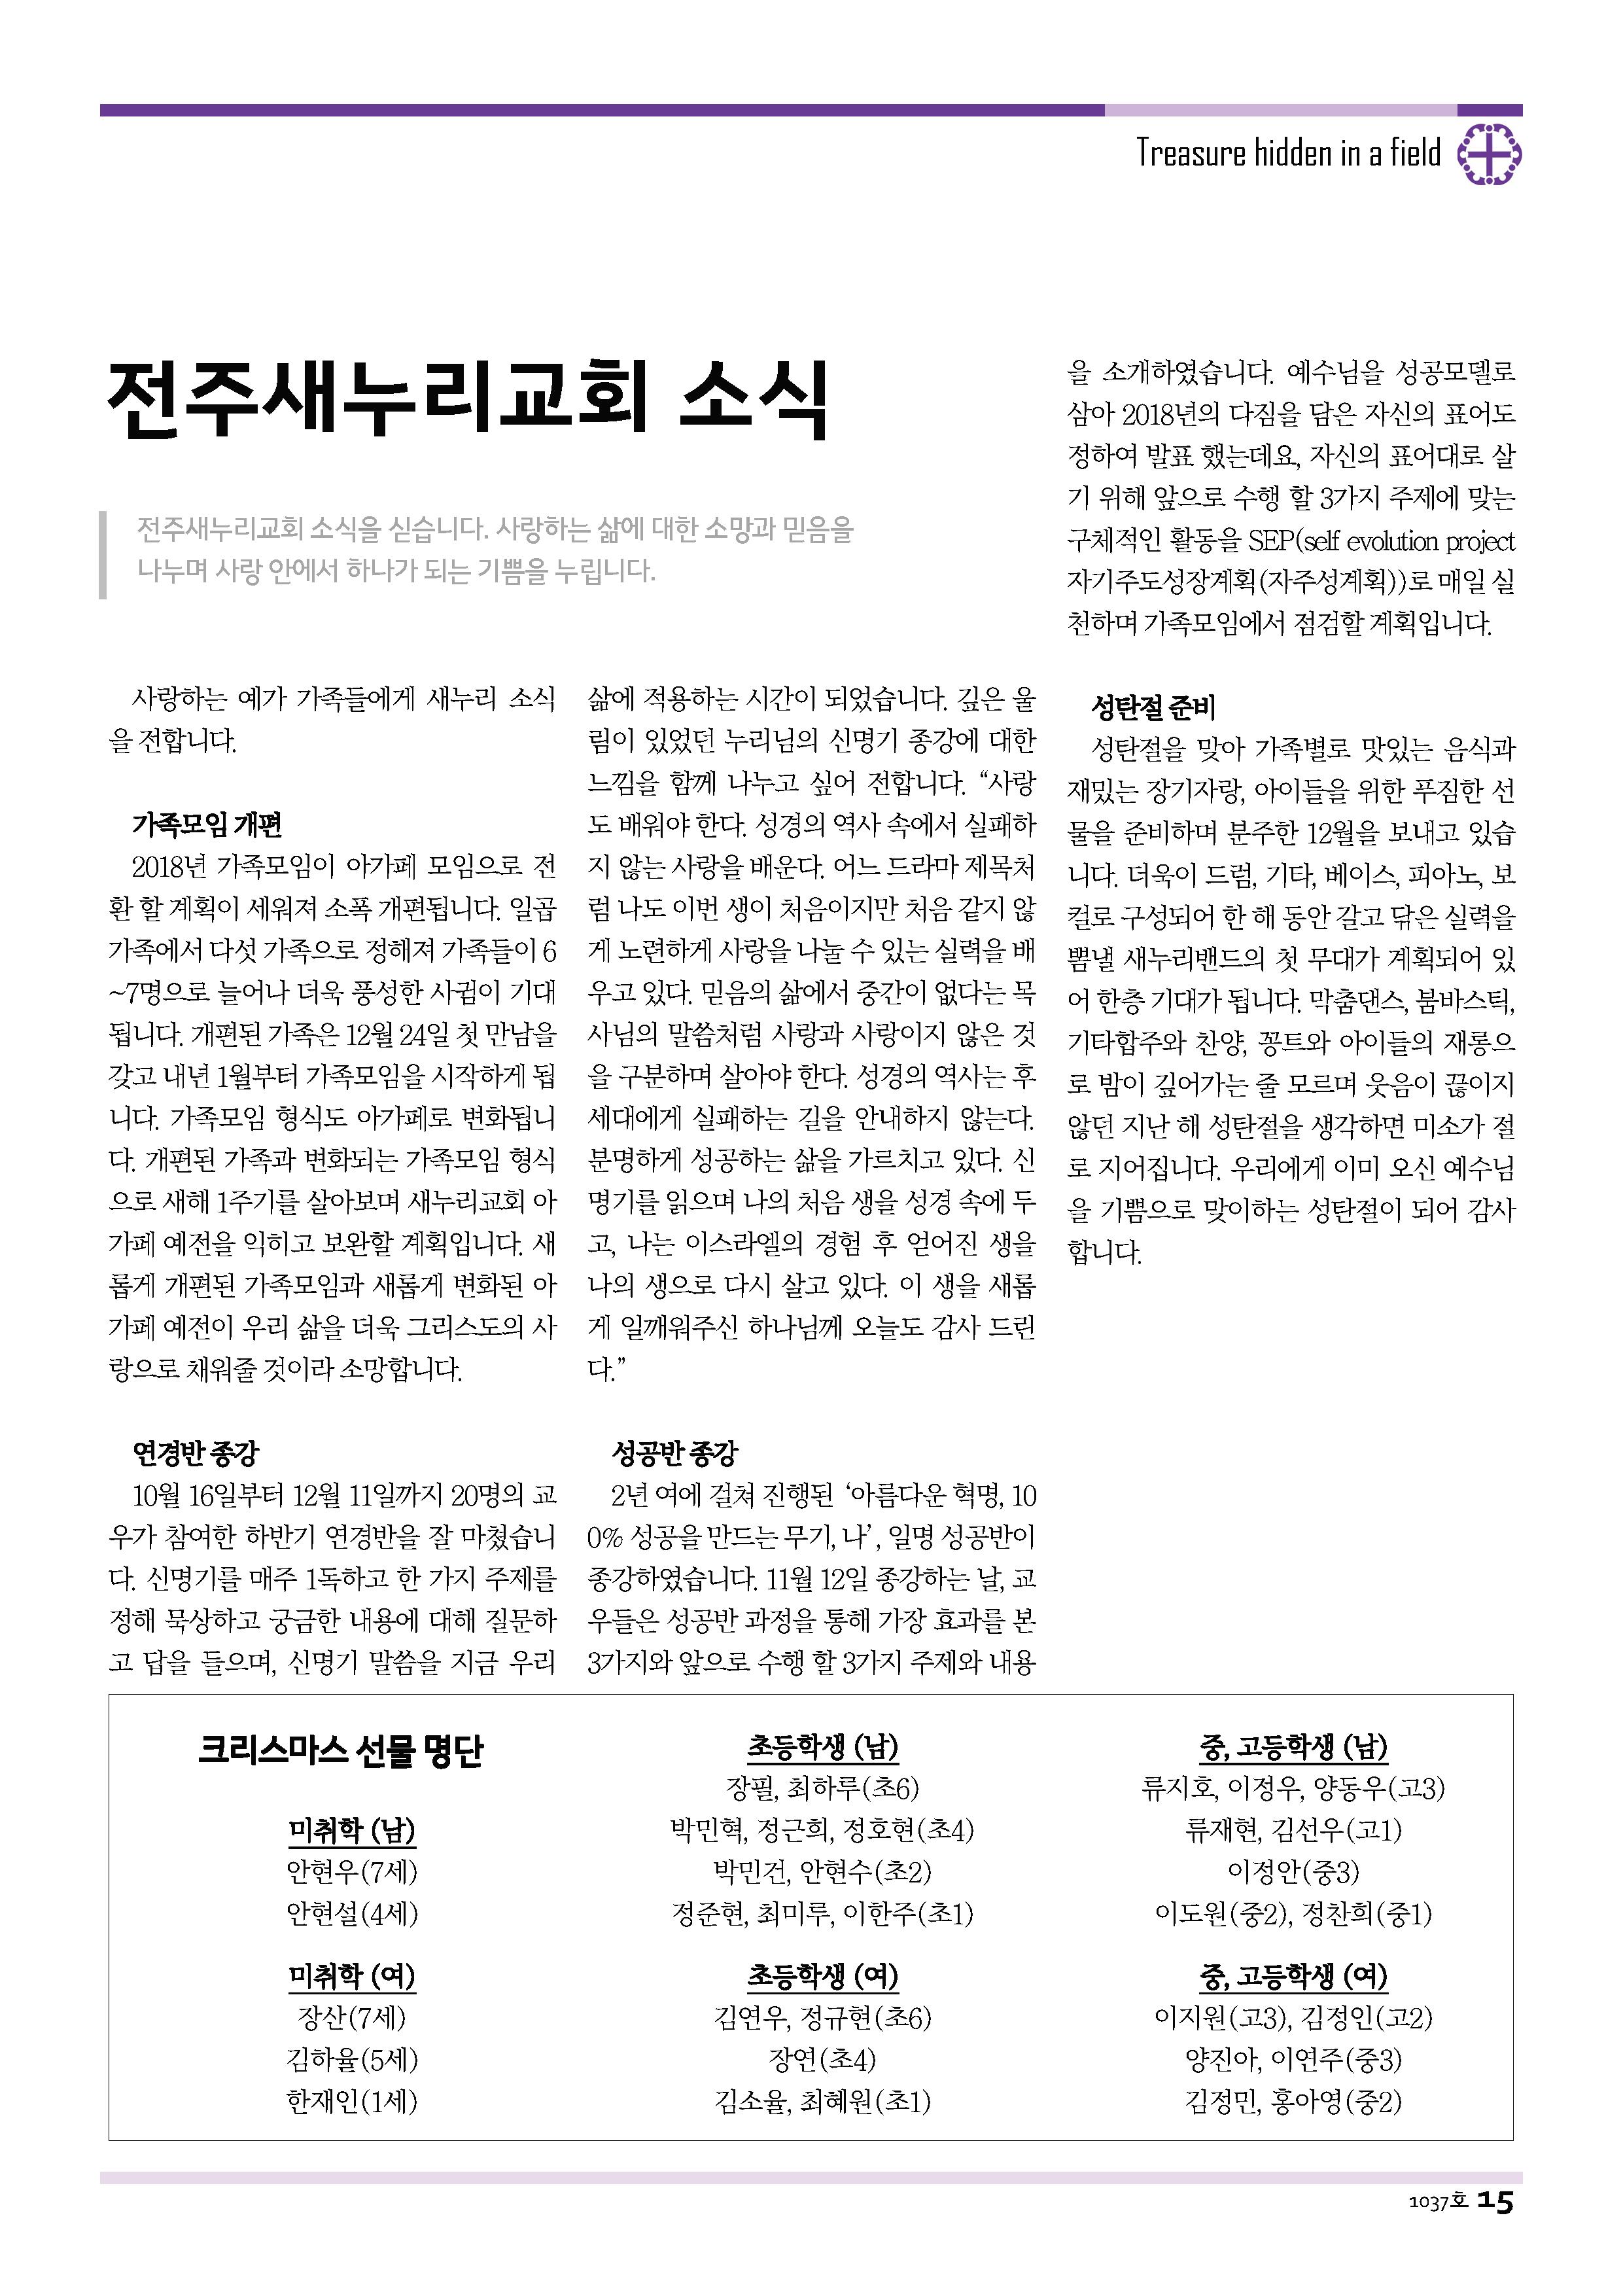 17sdjb1224_페이지_15.png